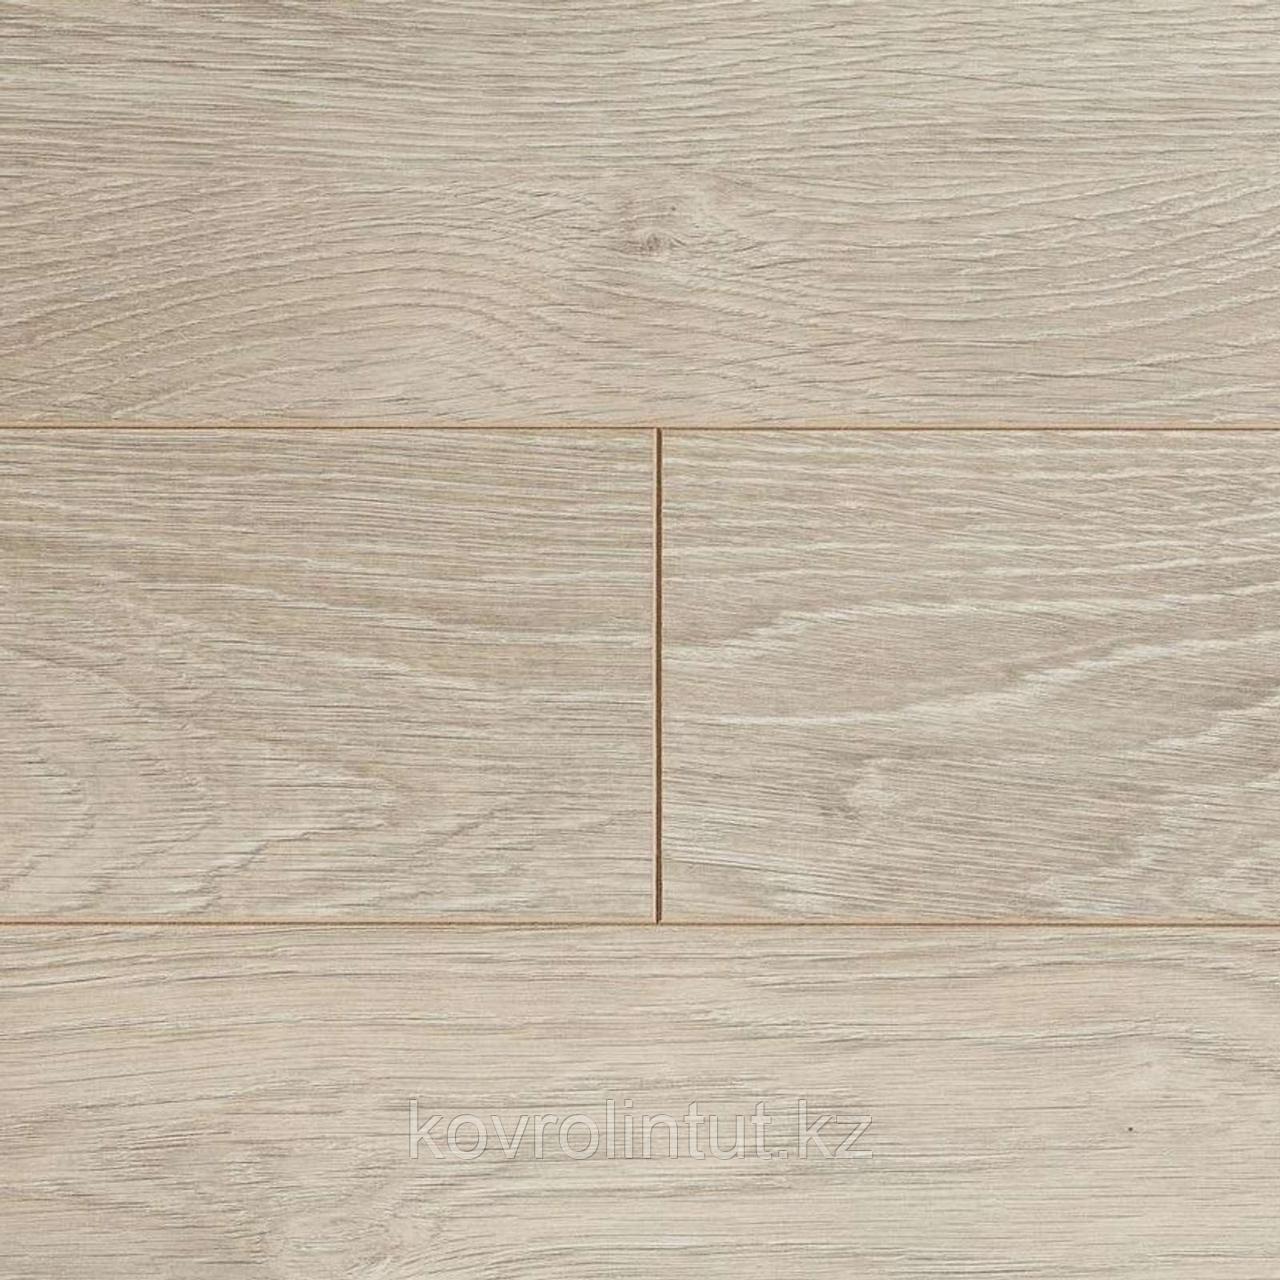 Ламинат Platinium Milo D3034 Ferrara Oak, 1380х193х8мм, 32кл (2,397м2, 9шт в уп)